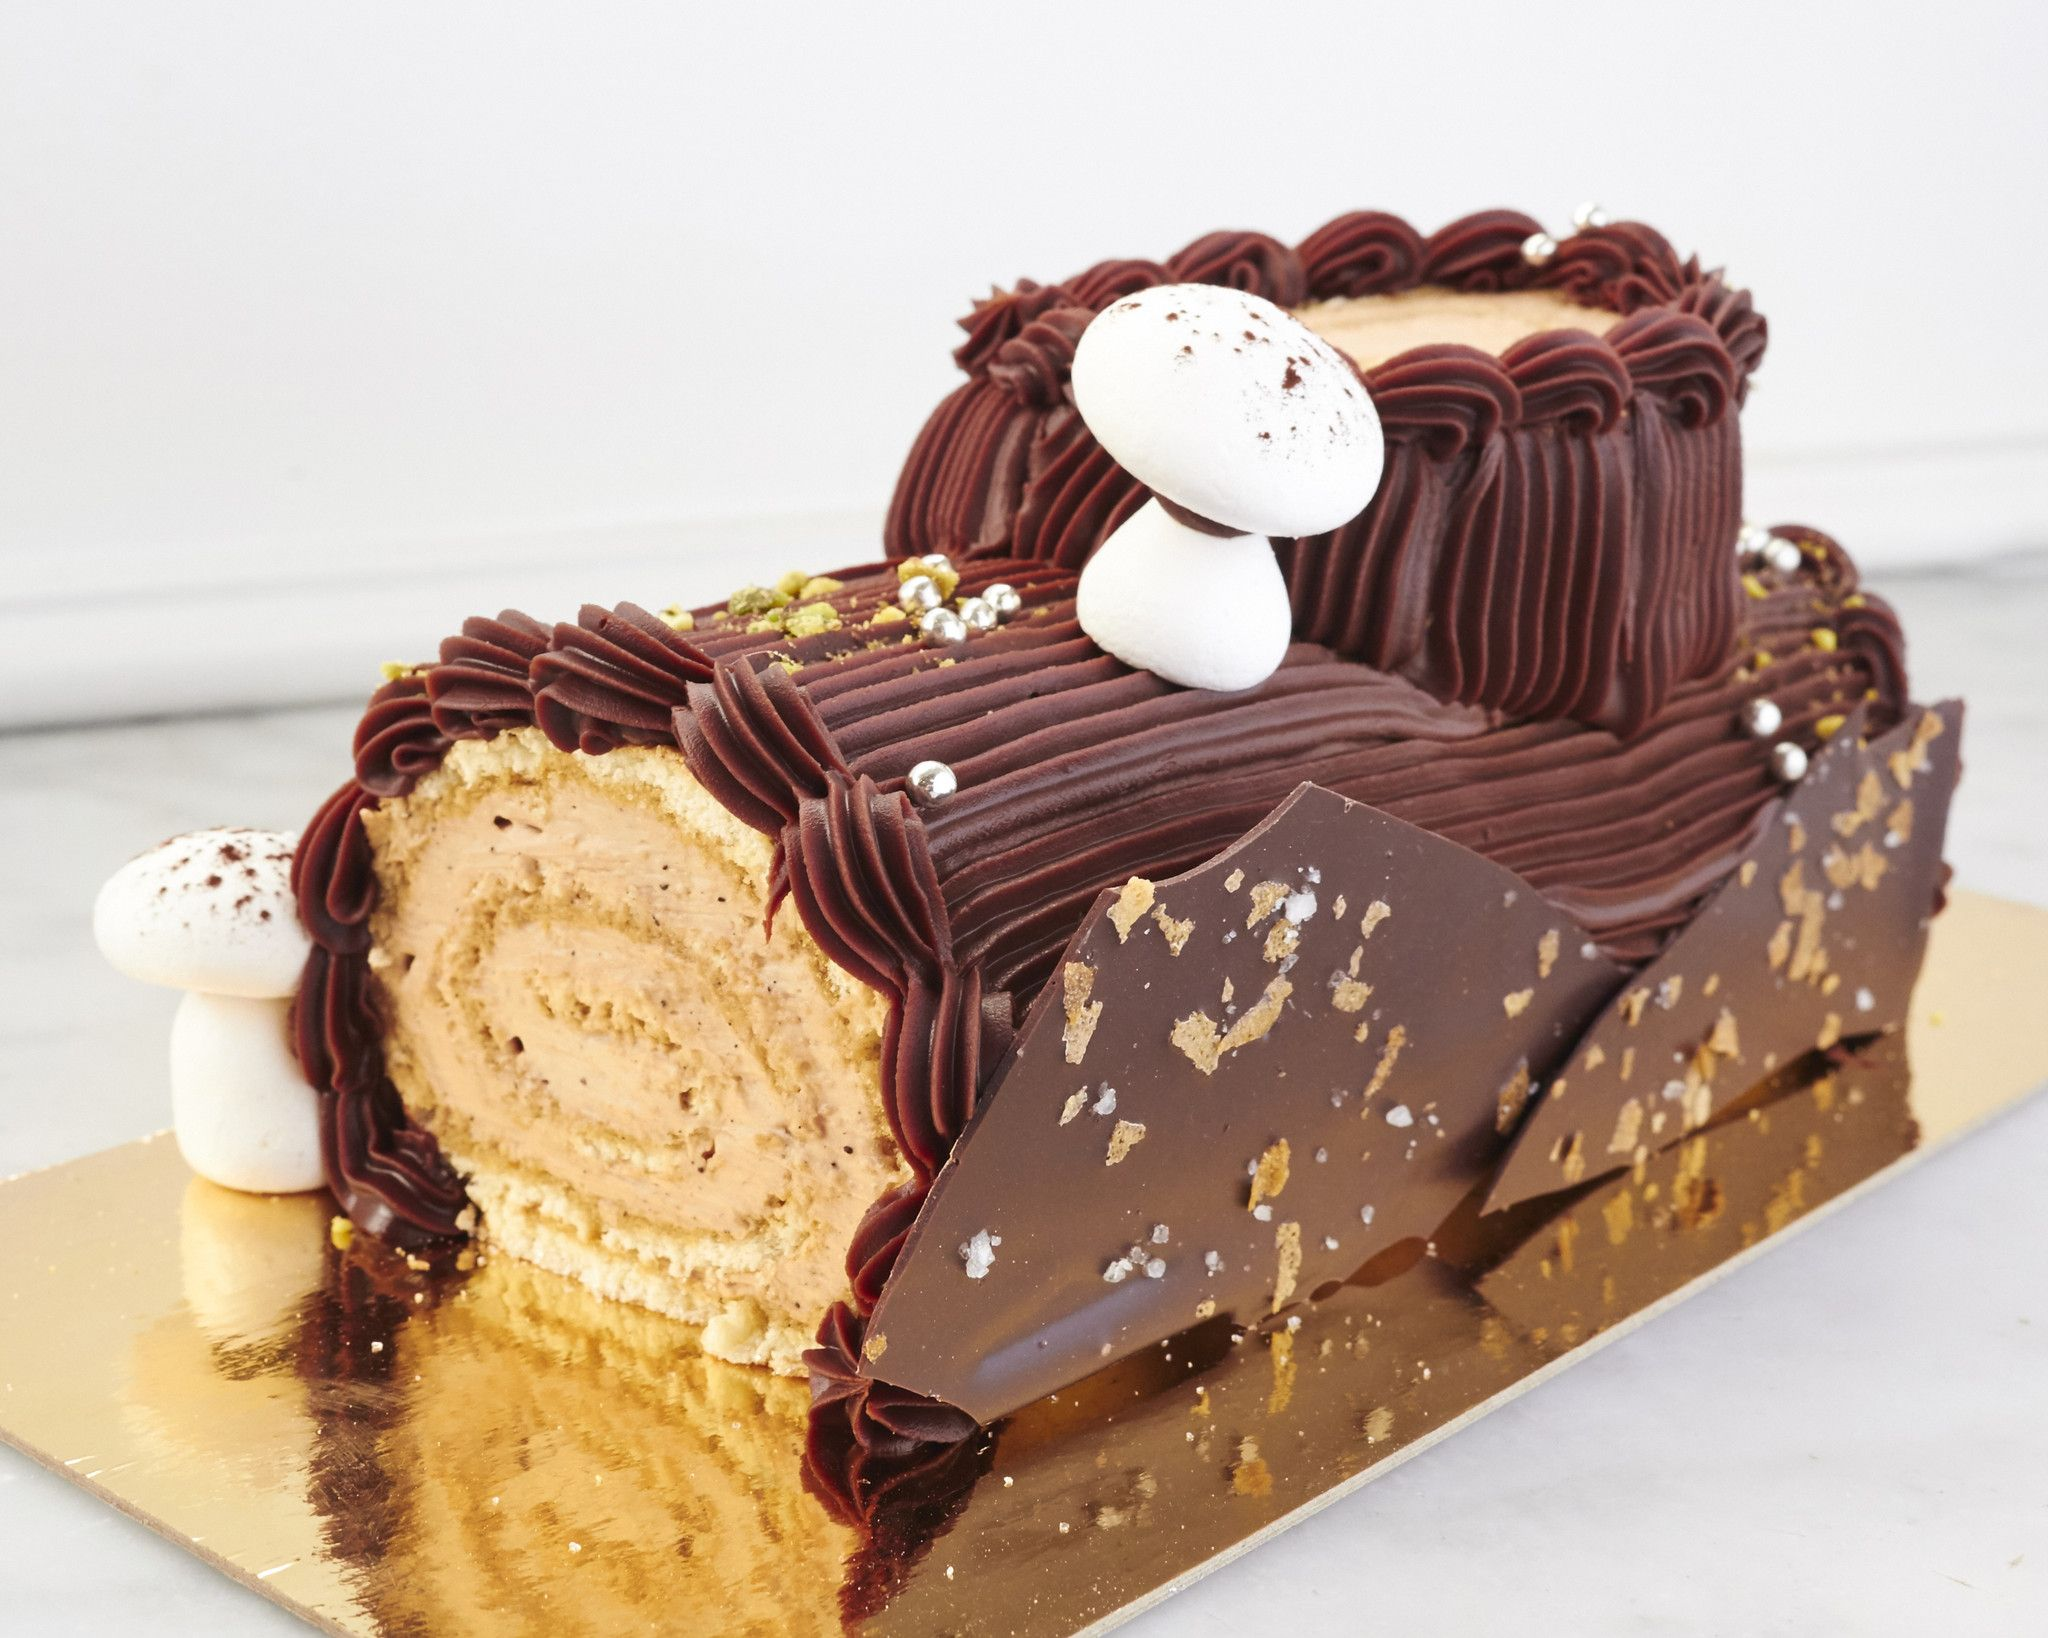 Bûche de Noël from Duchess Bake Shop   Yummy cakes